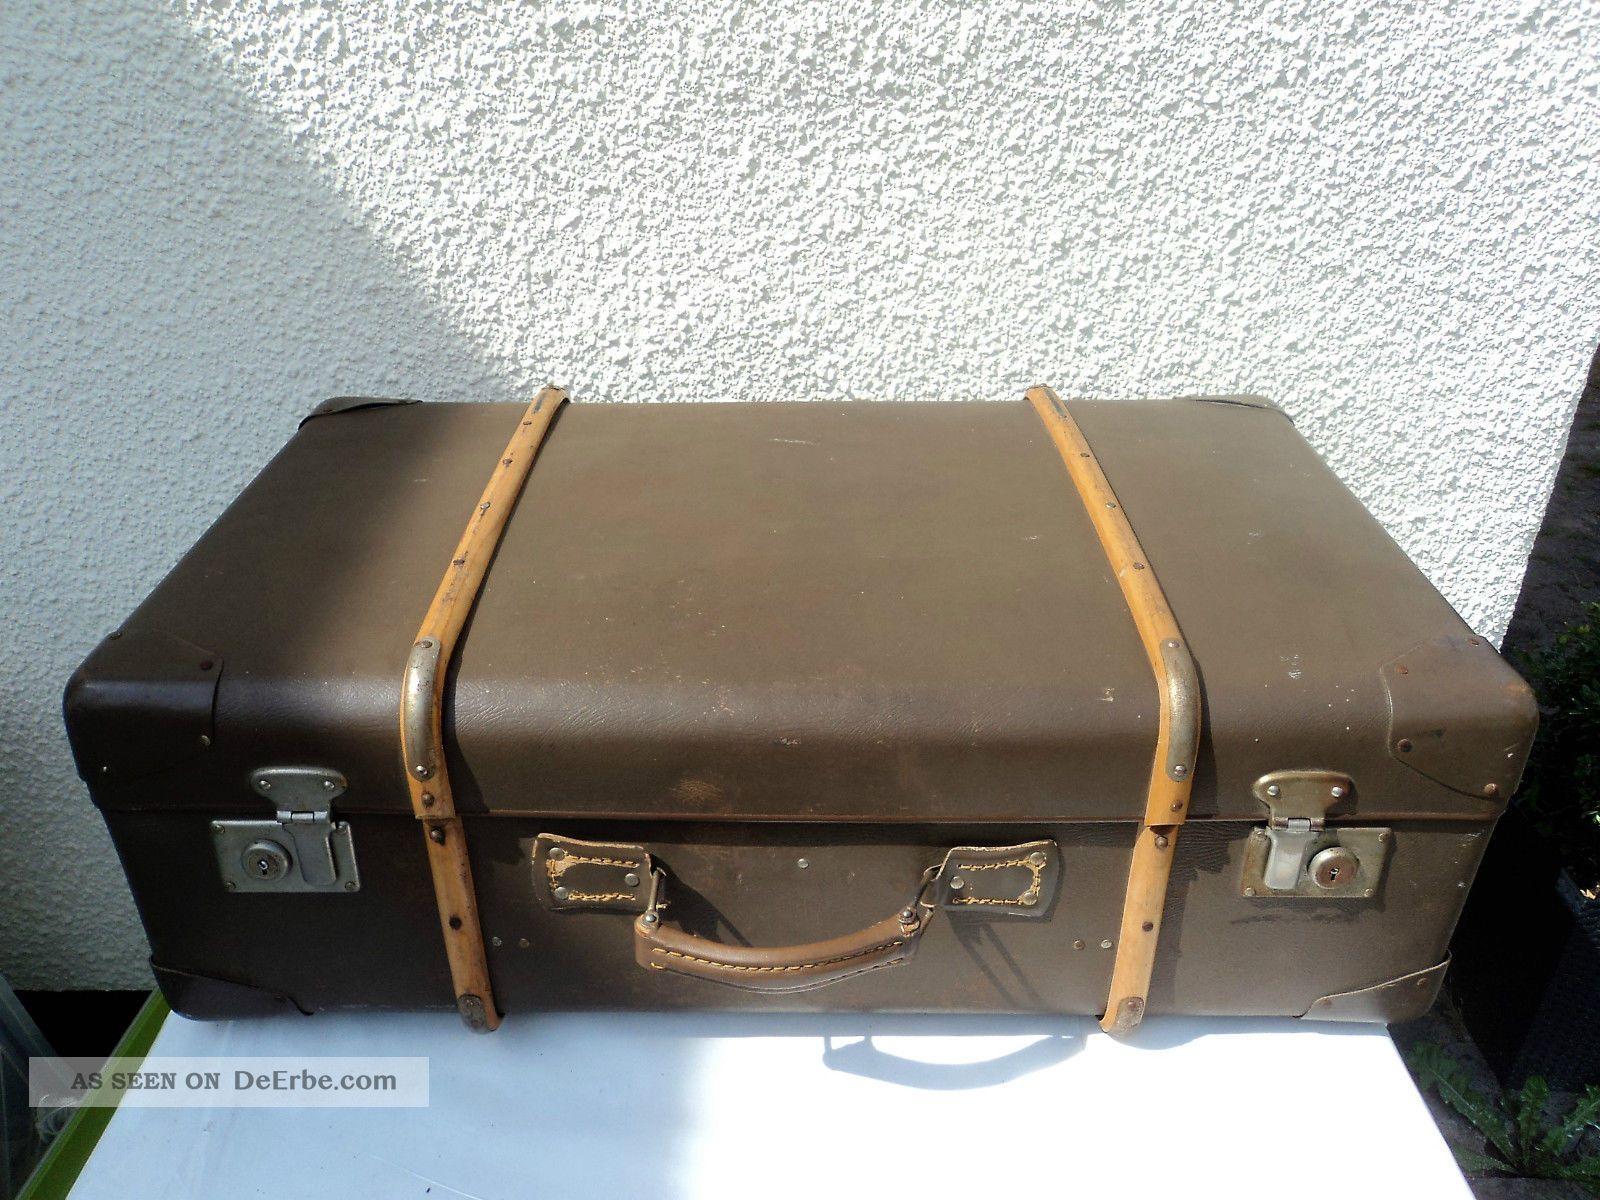 Alte Koffer Dekorieren Antike Truhe Aus Belgien Alter